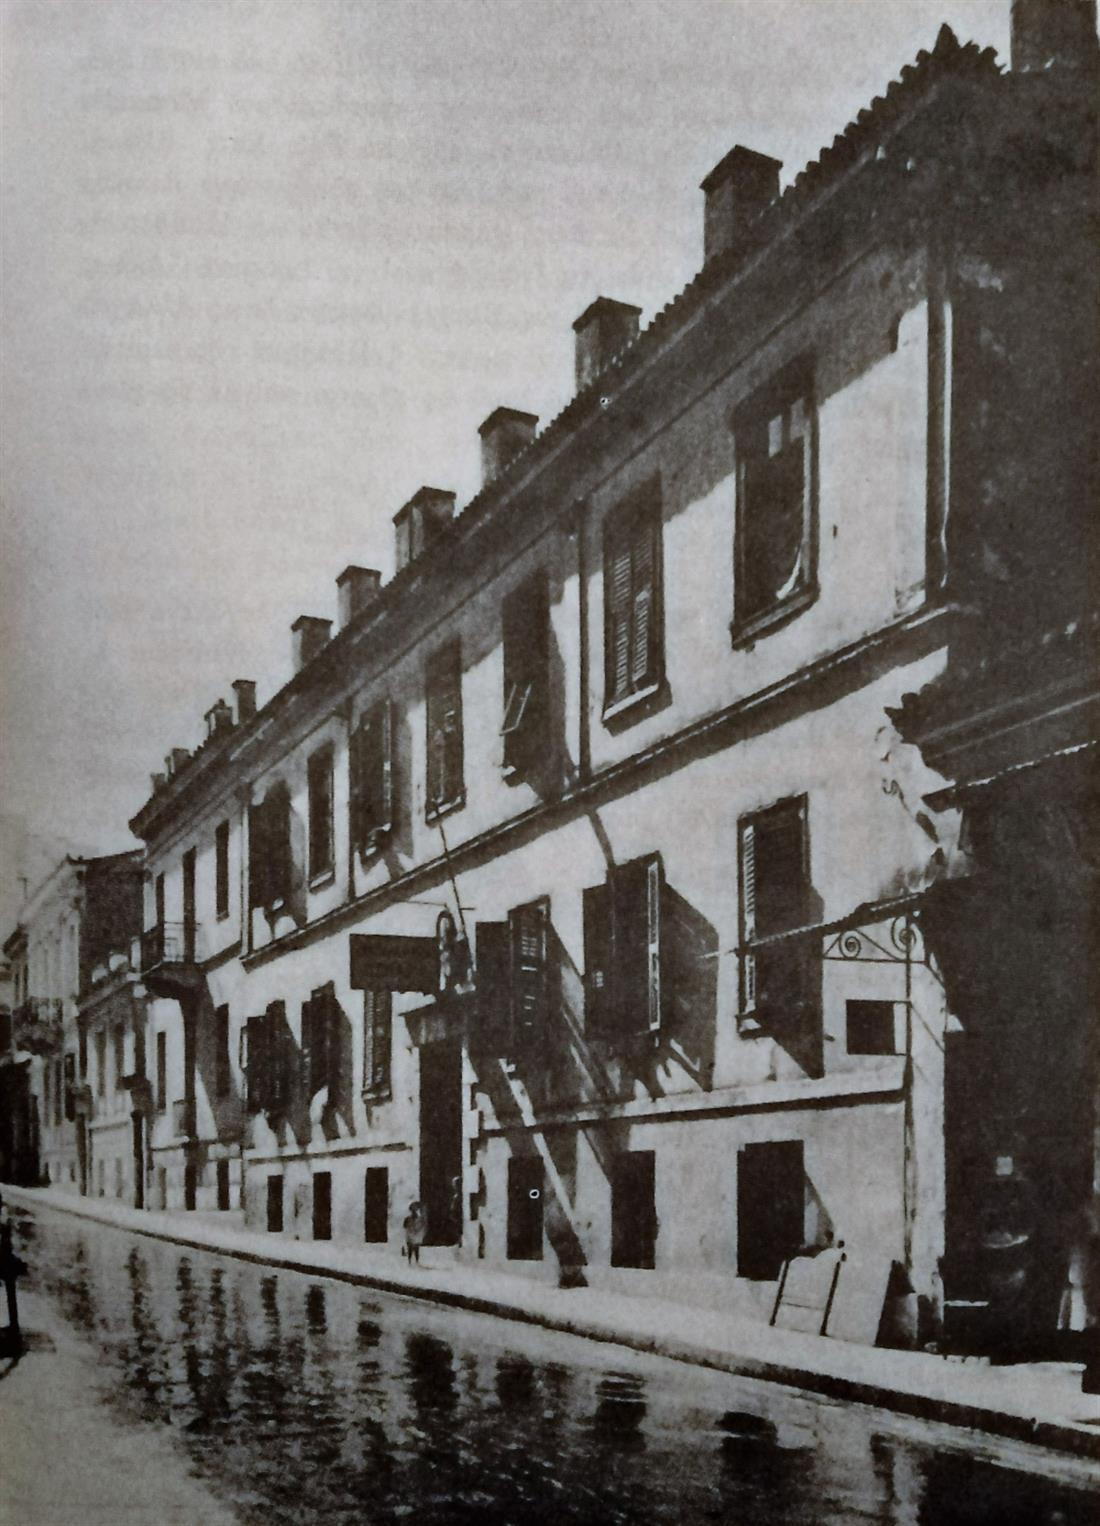 HOTEL - Η ωραία Γαλλία - Αιόλου - 1860